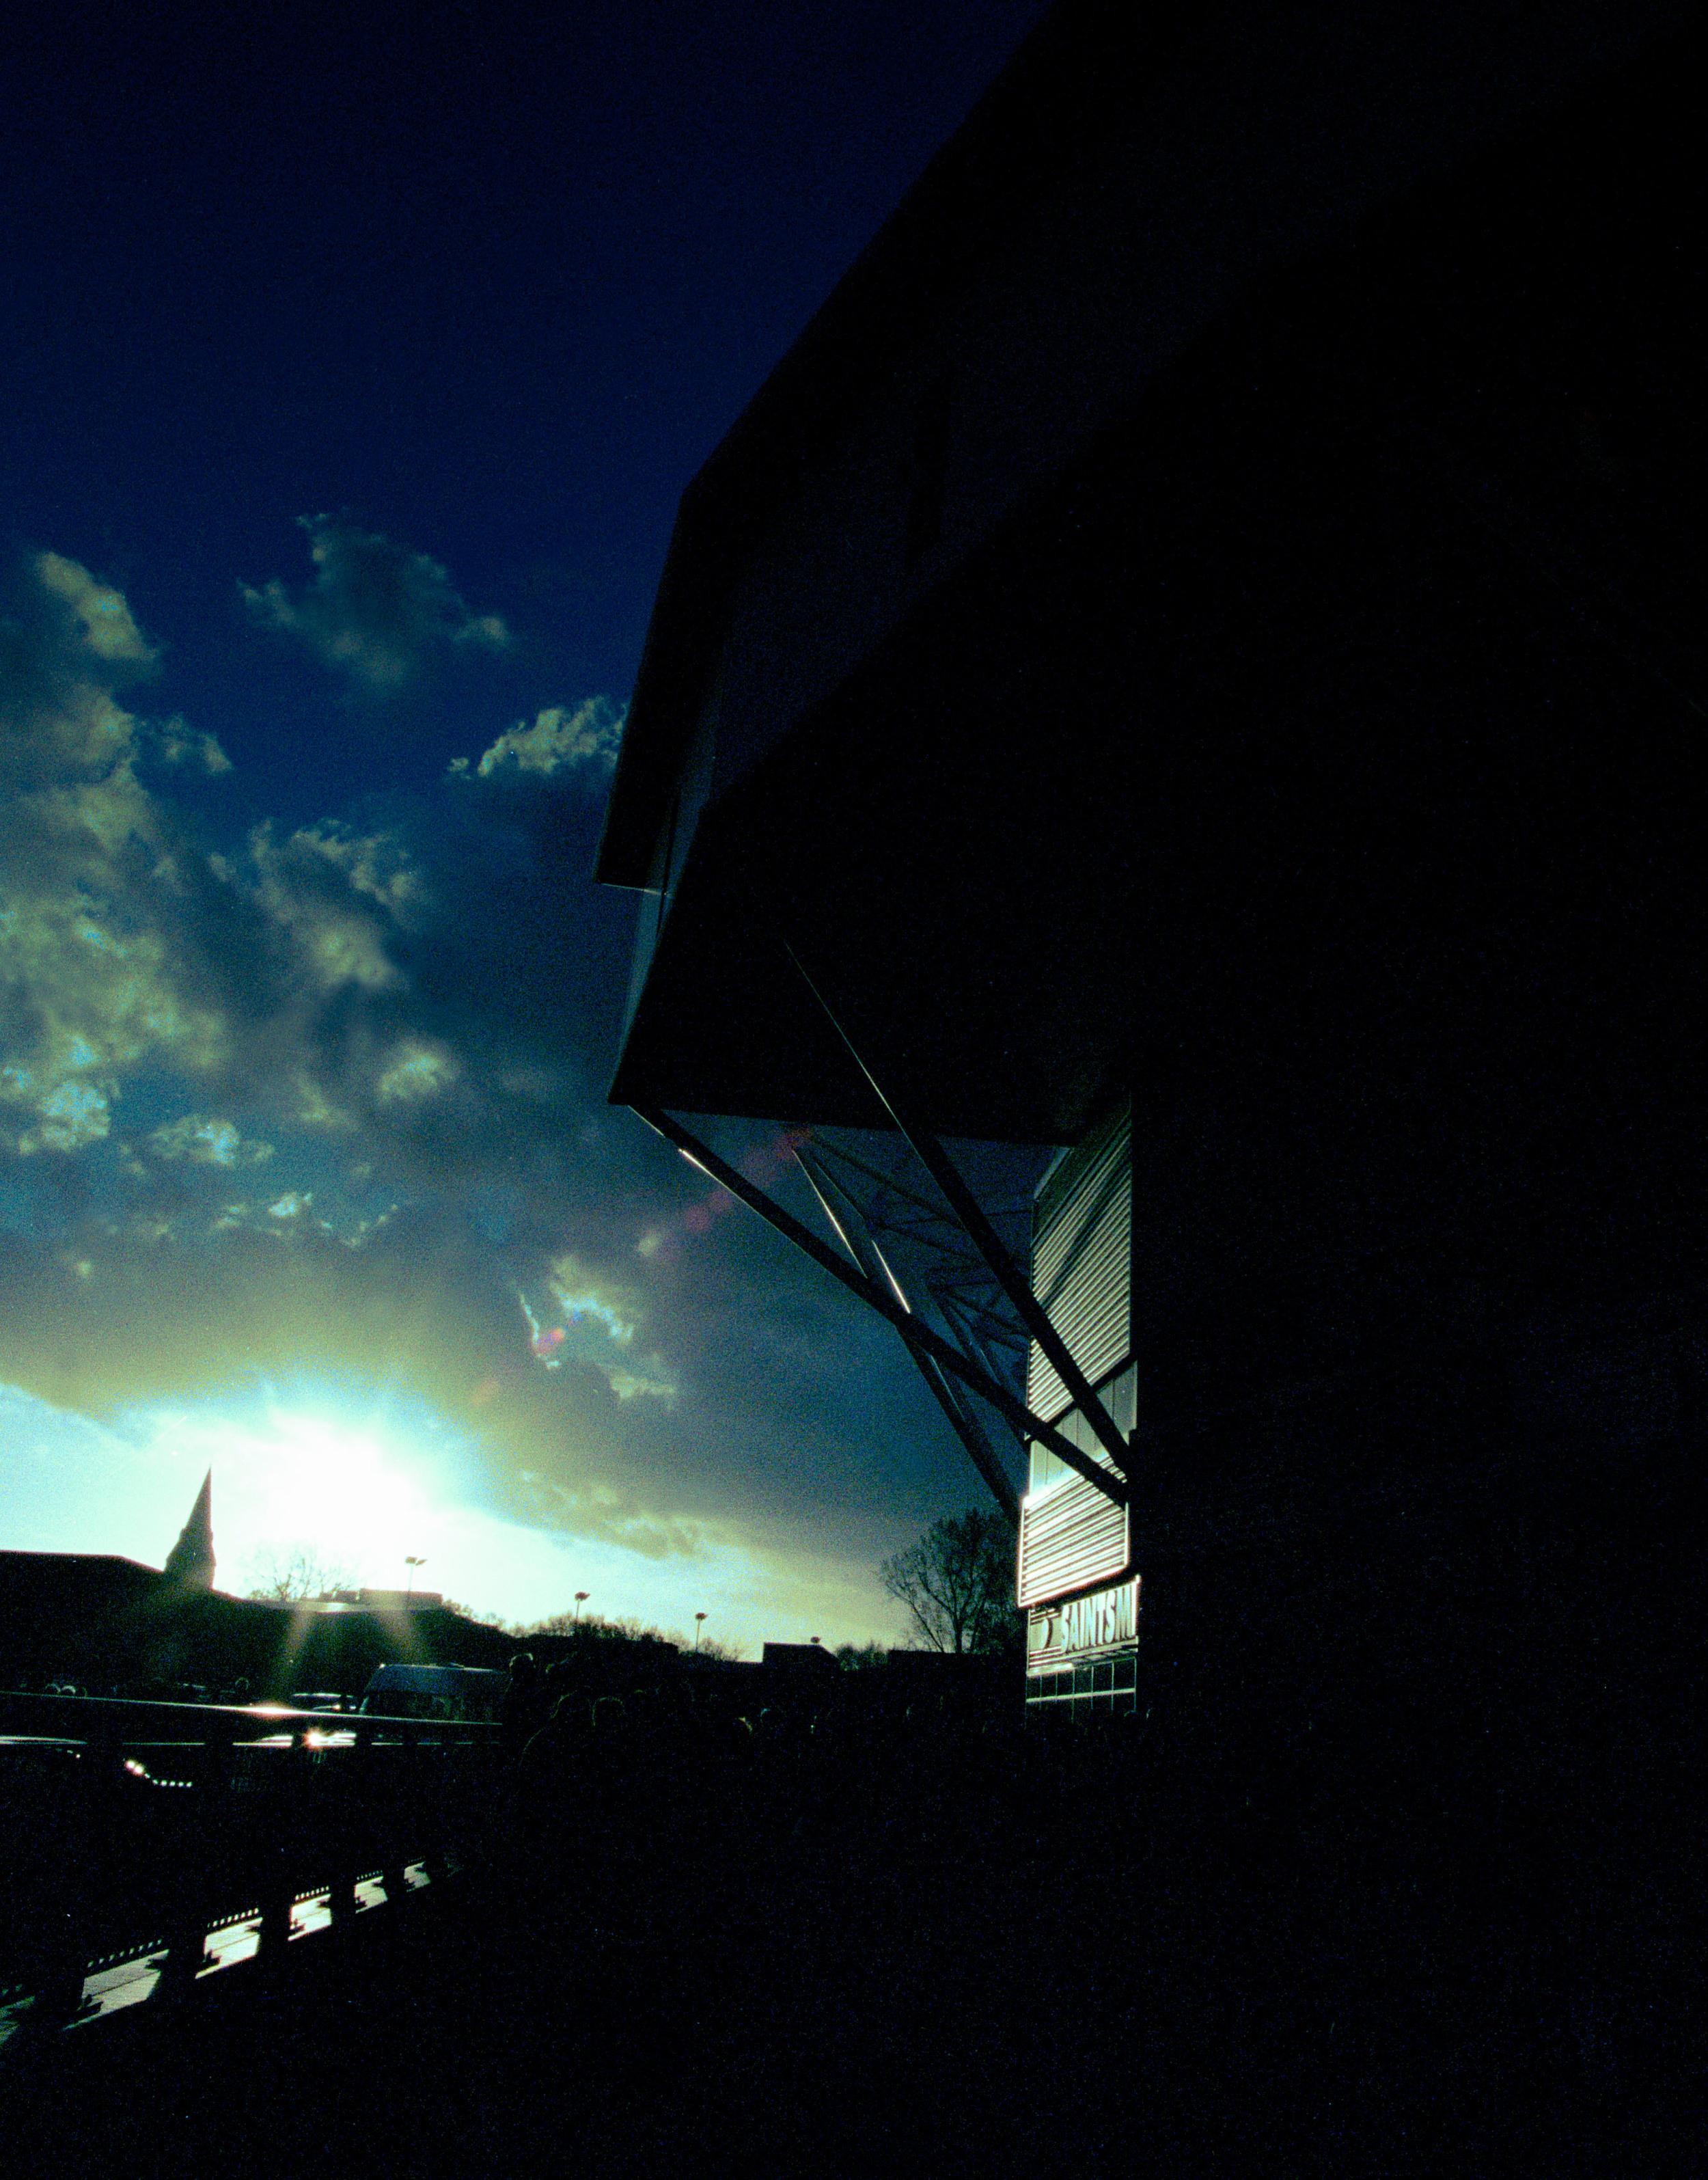 Stadium002 2.jpg